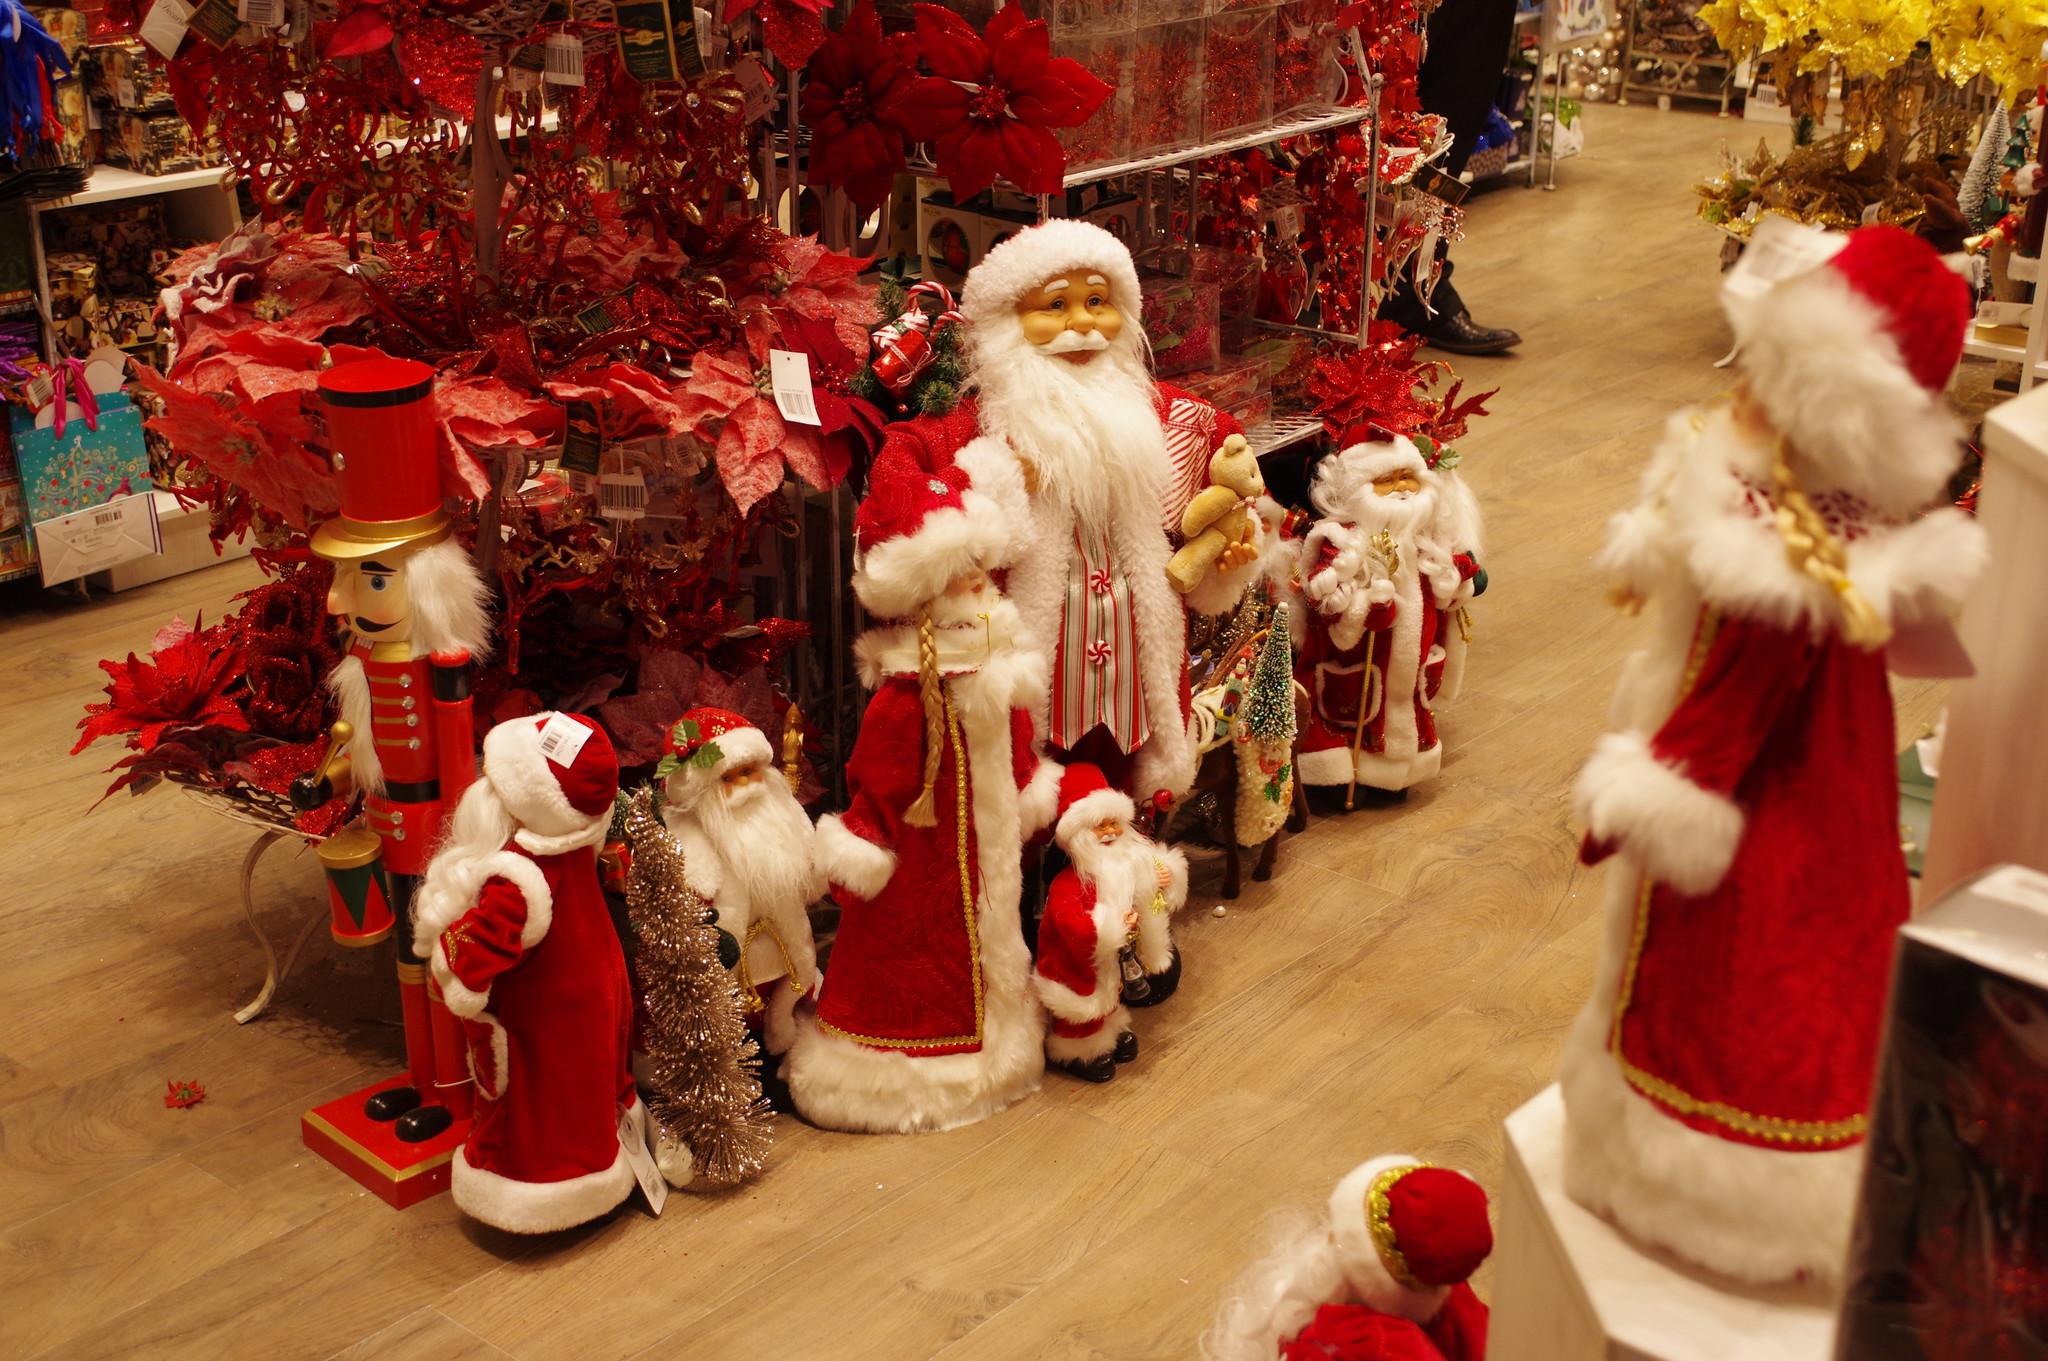 В ЦУМе открылся новогодний базар